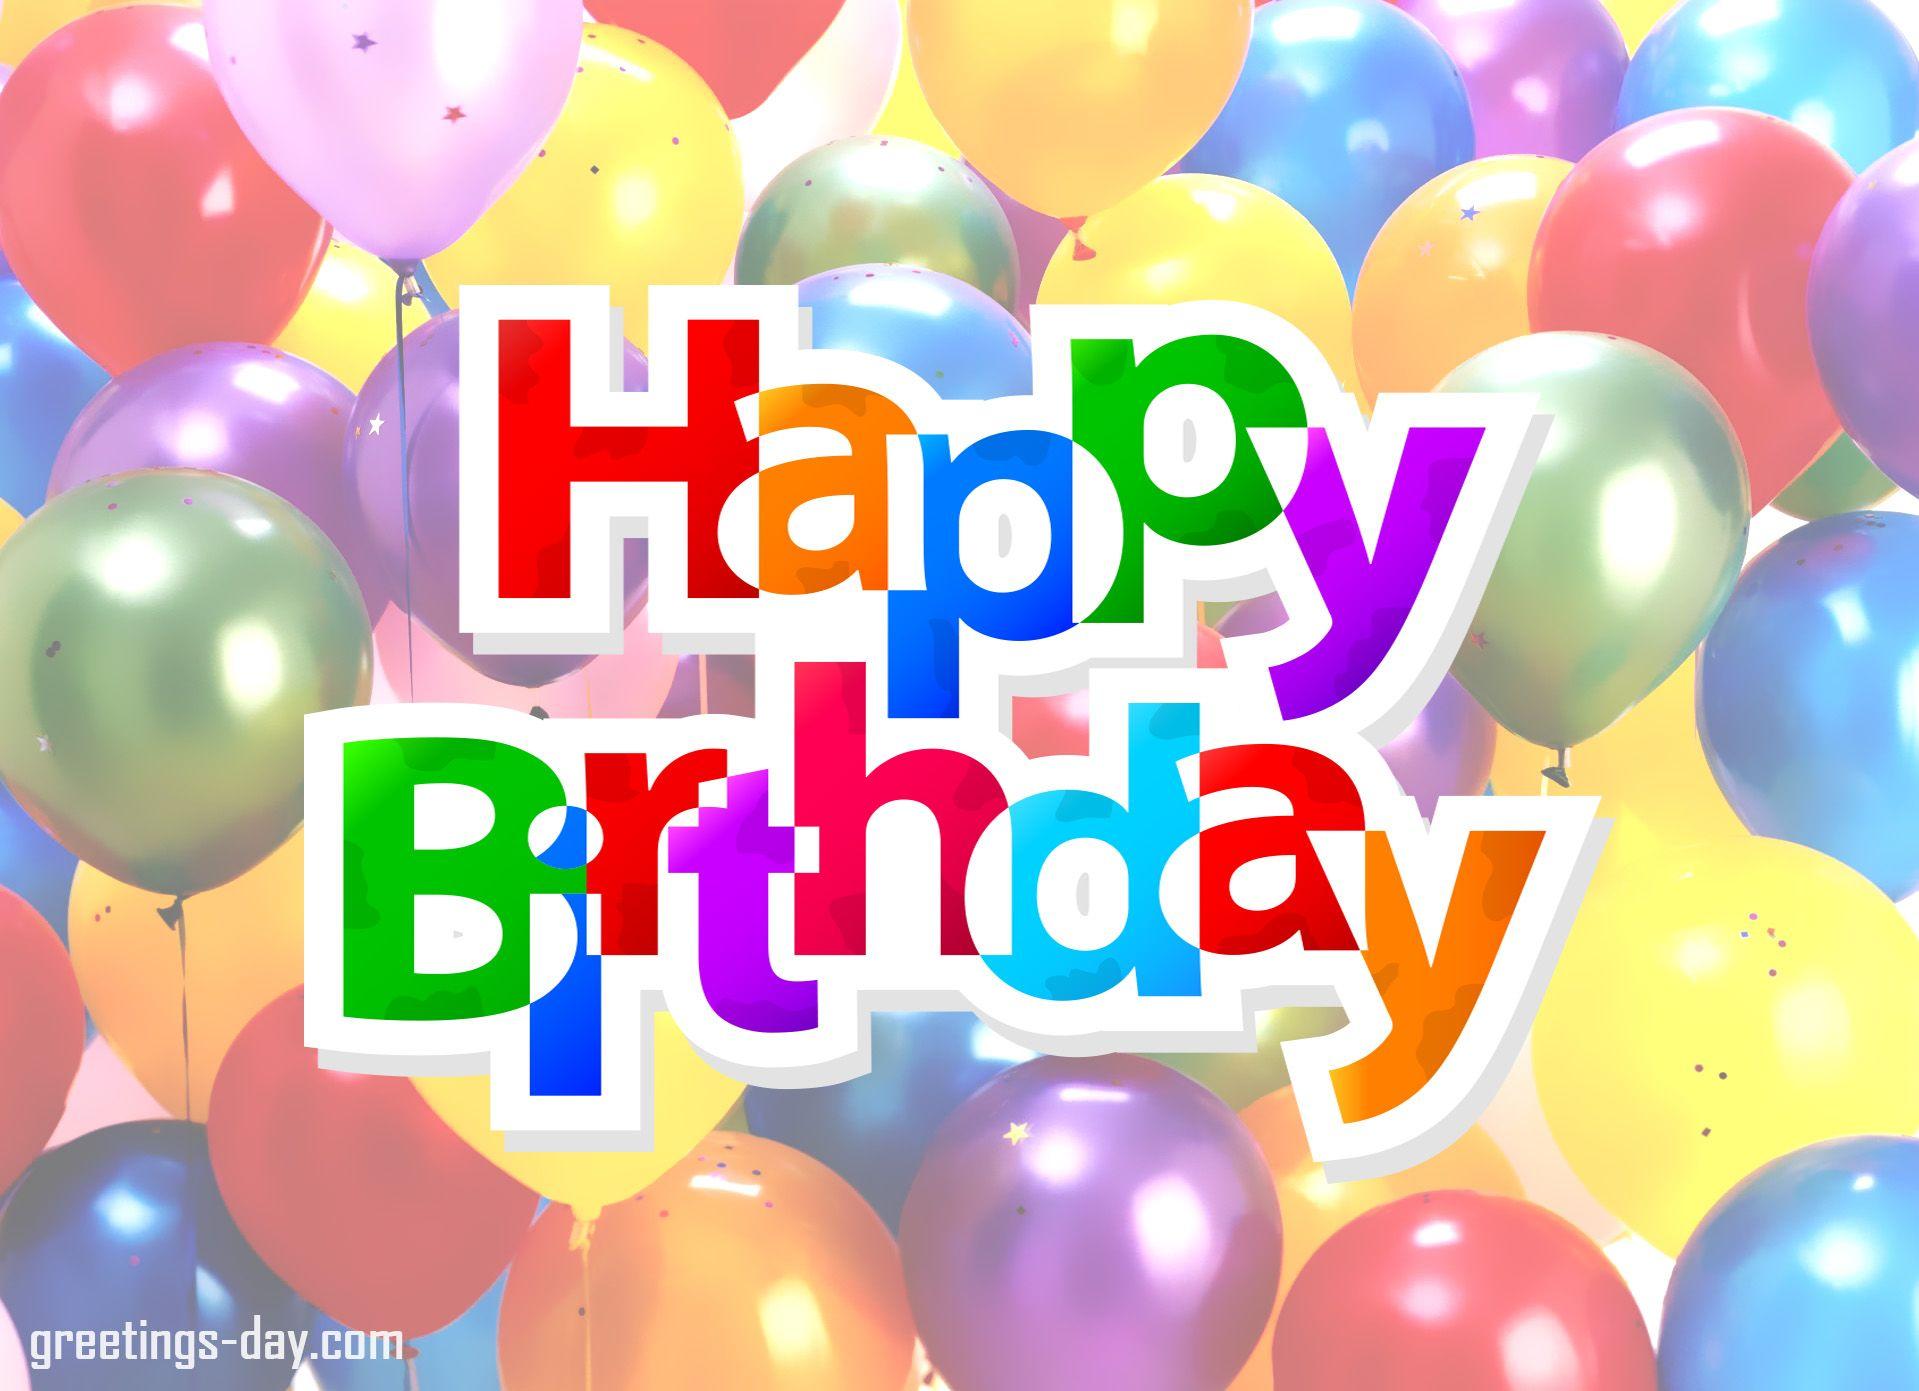 Greeting Ecards For Birthday Httpgreetings Daygreeting